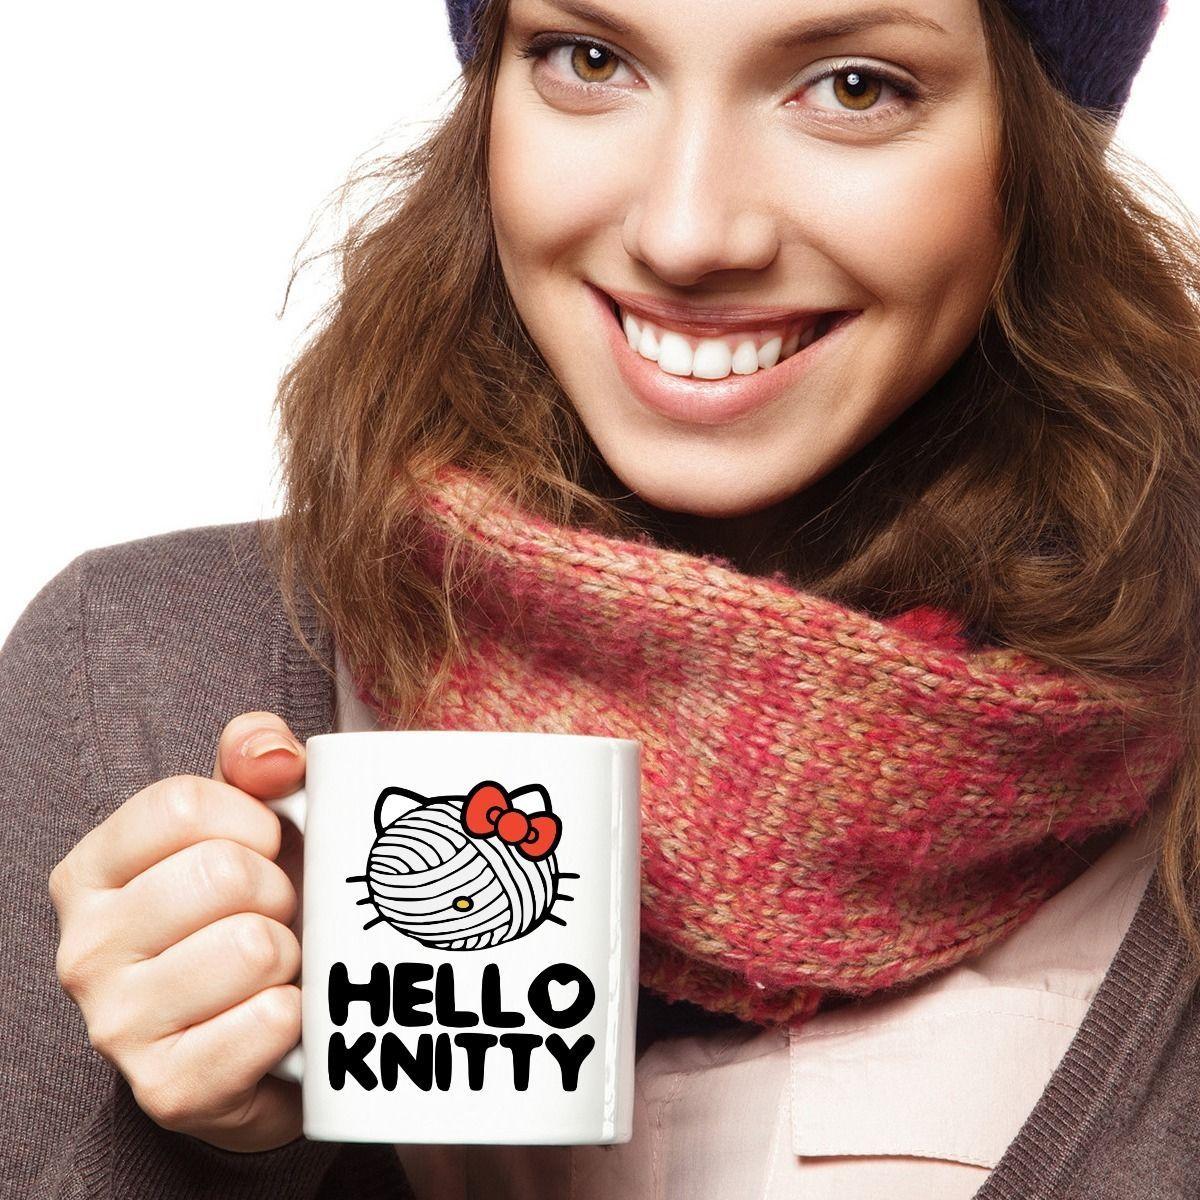 Knitting Mug Knitty Mothers Day Funny Cute Cat Kitty Face Yarn Mom Grandma Aunt